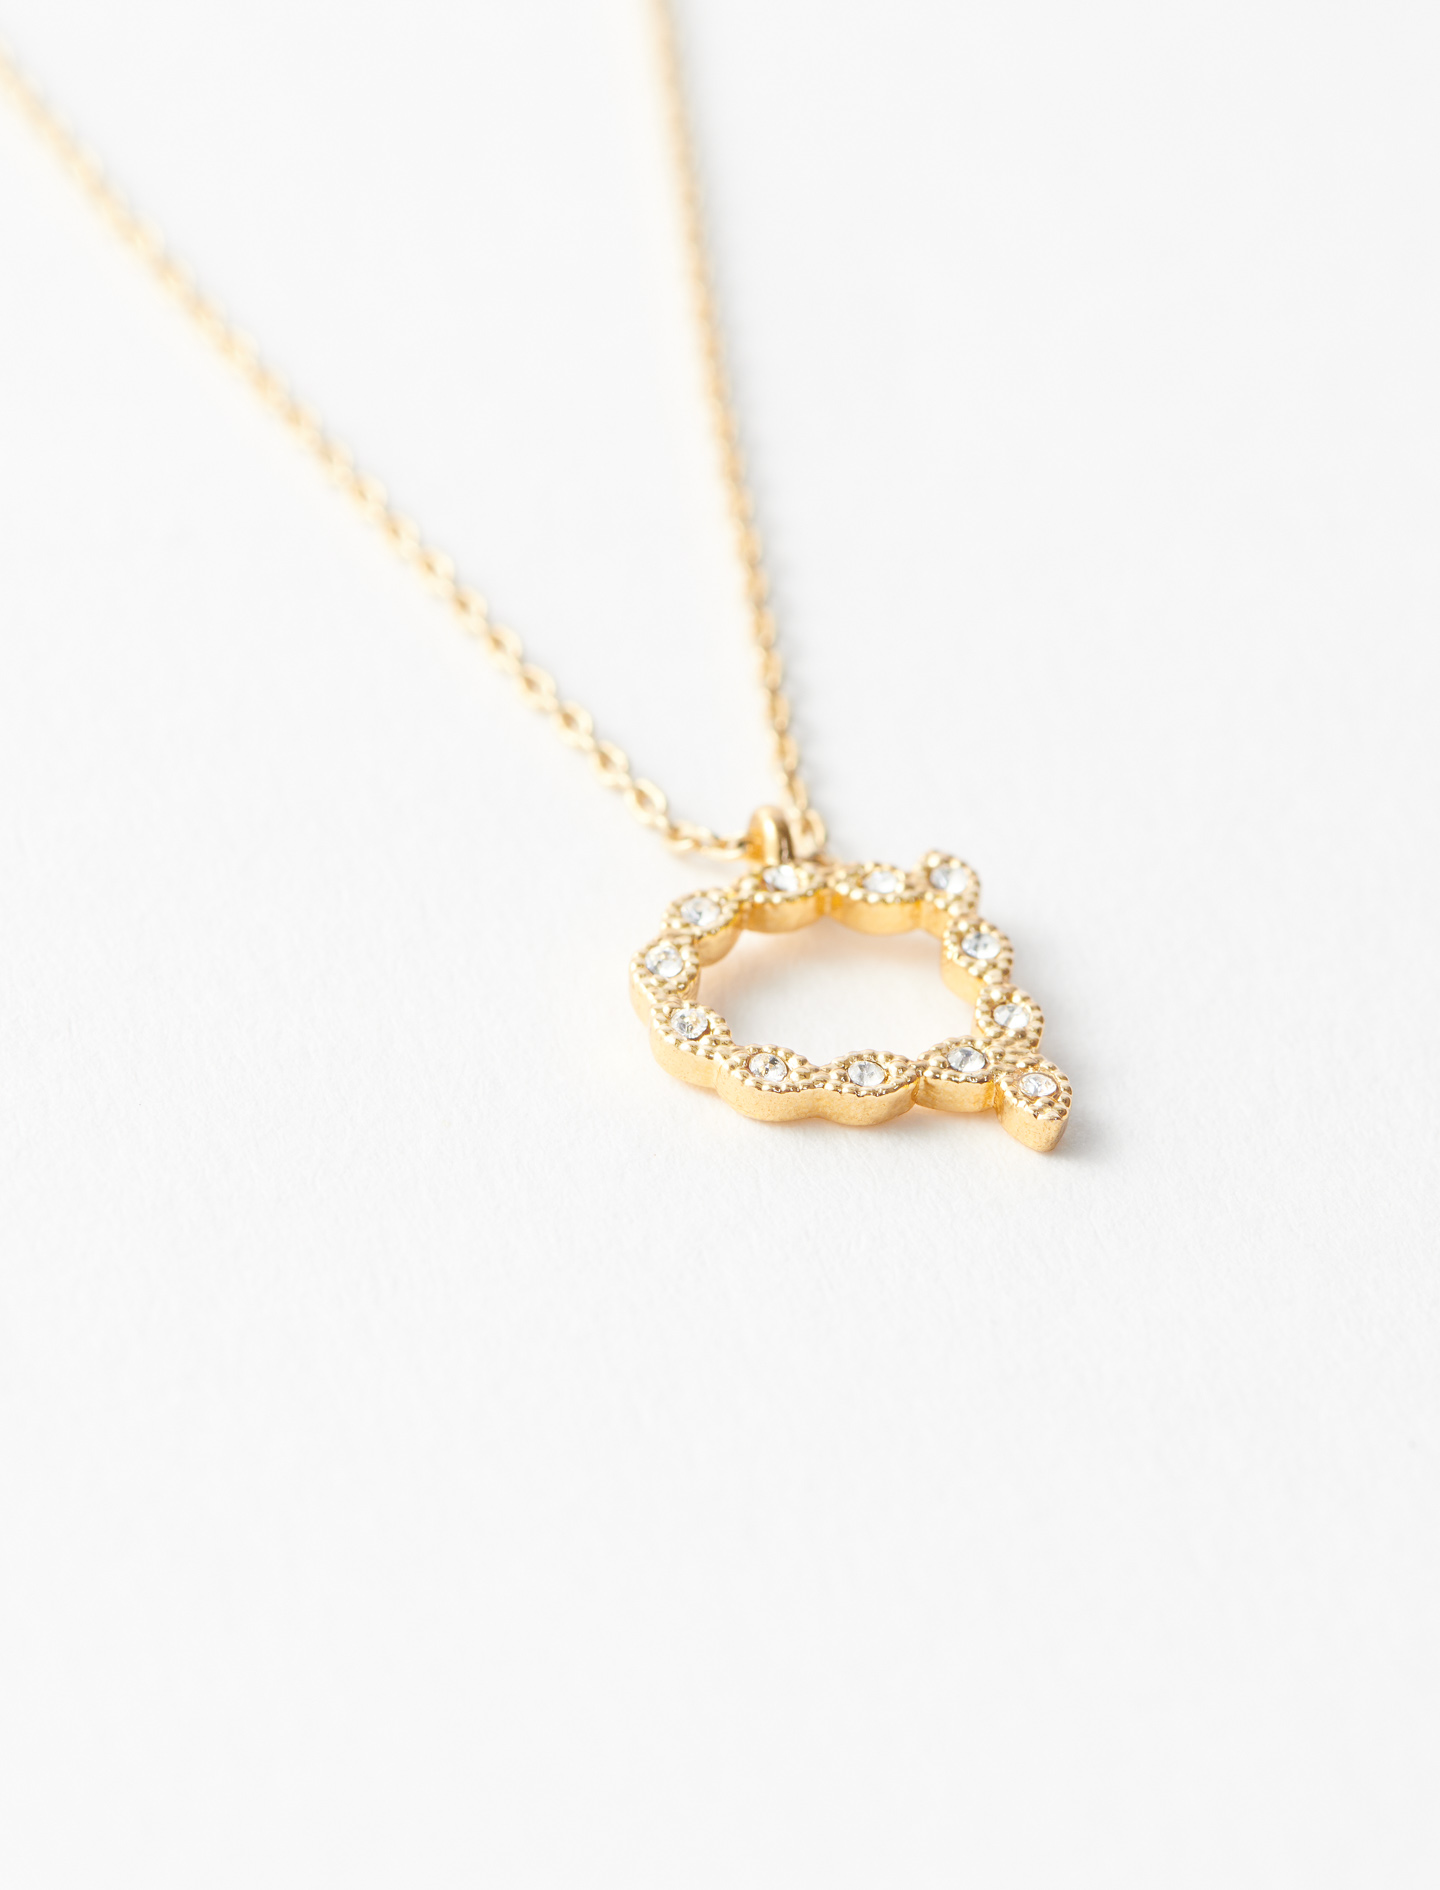 Rhinestone A necklace - Gold